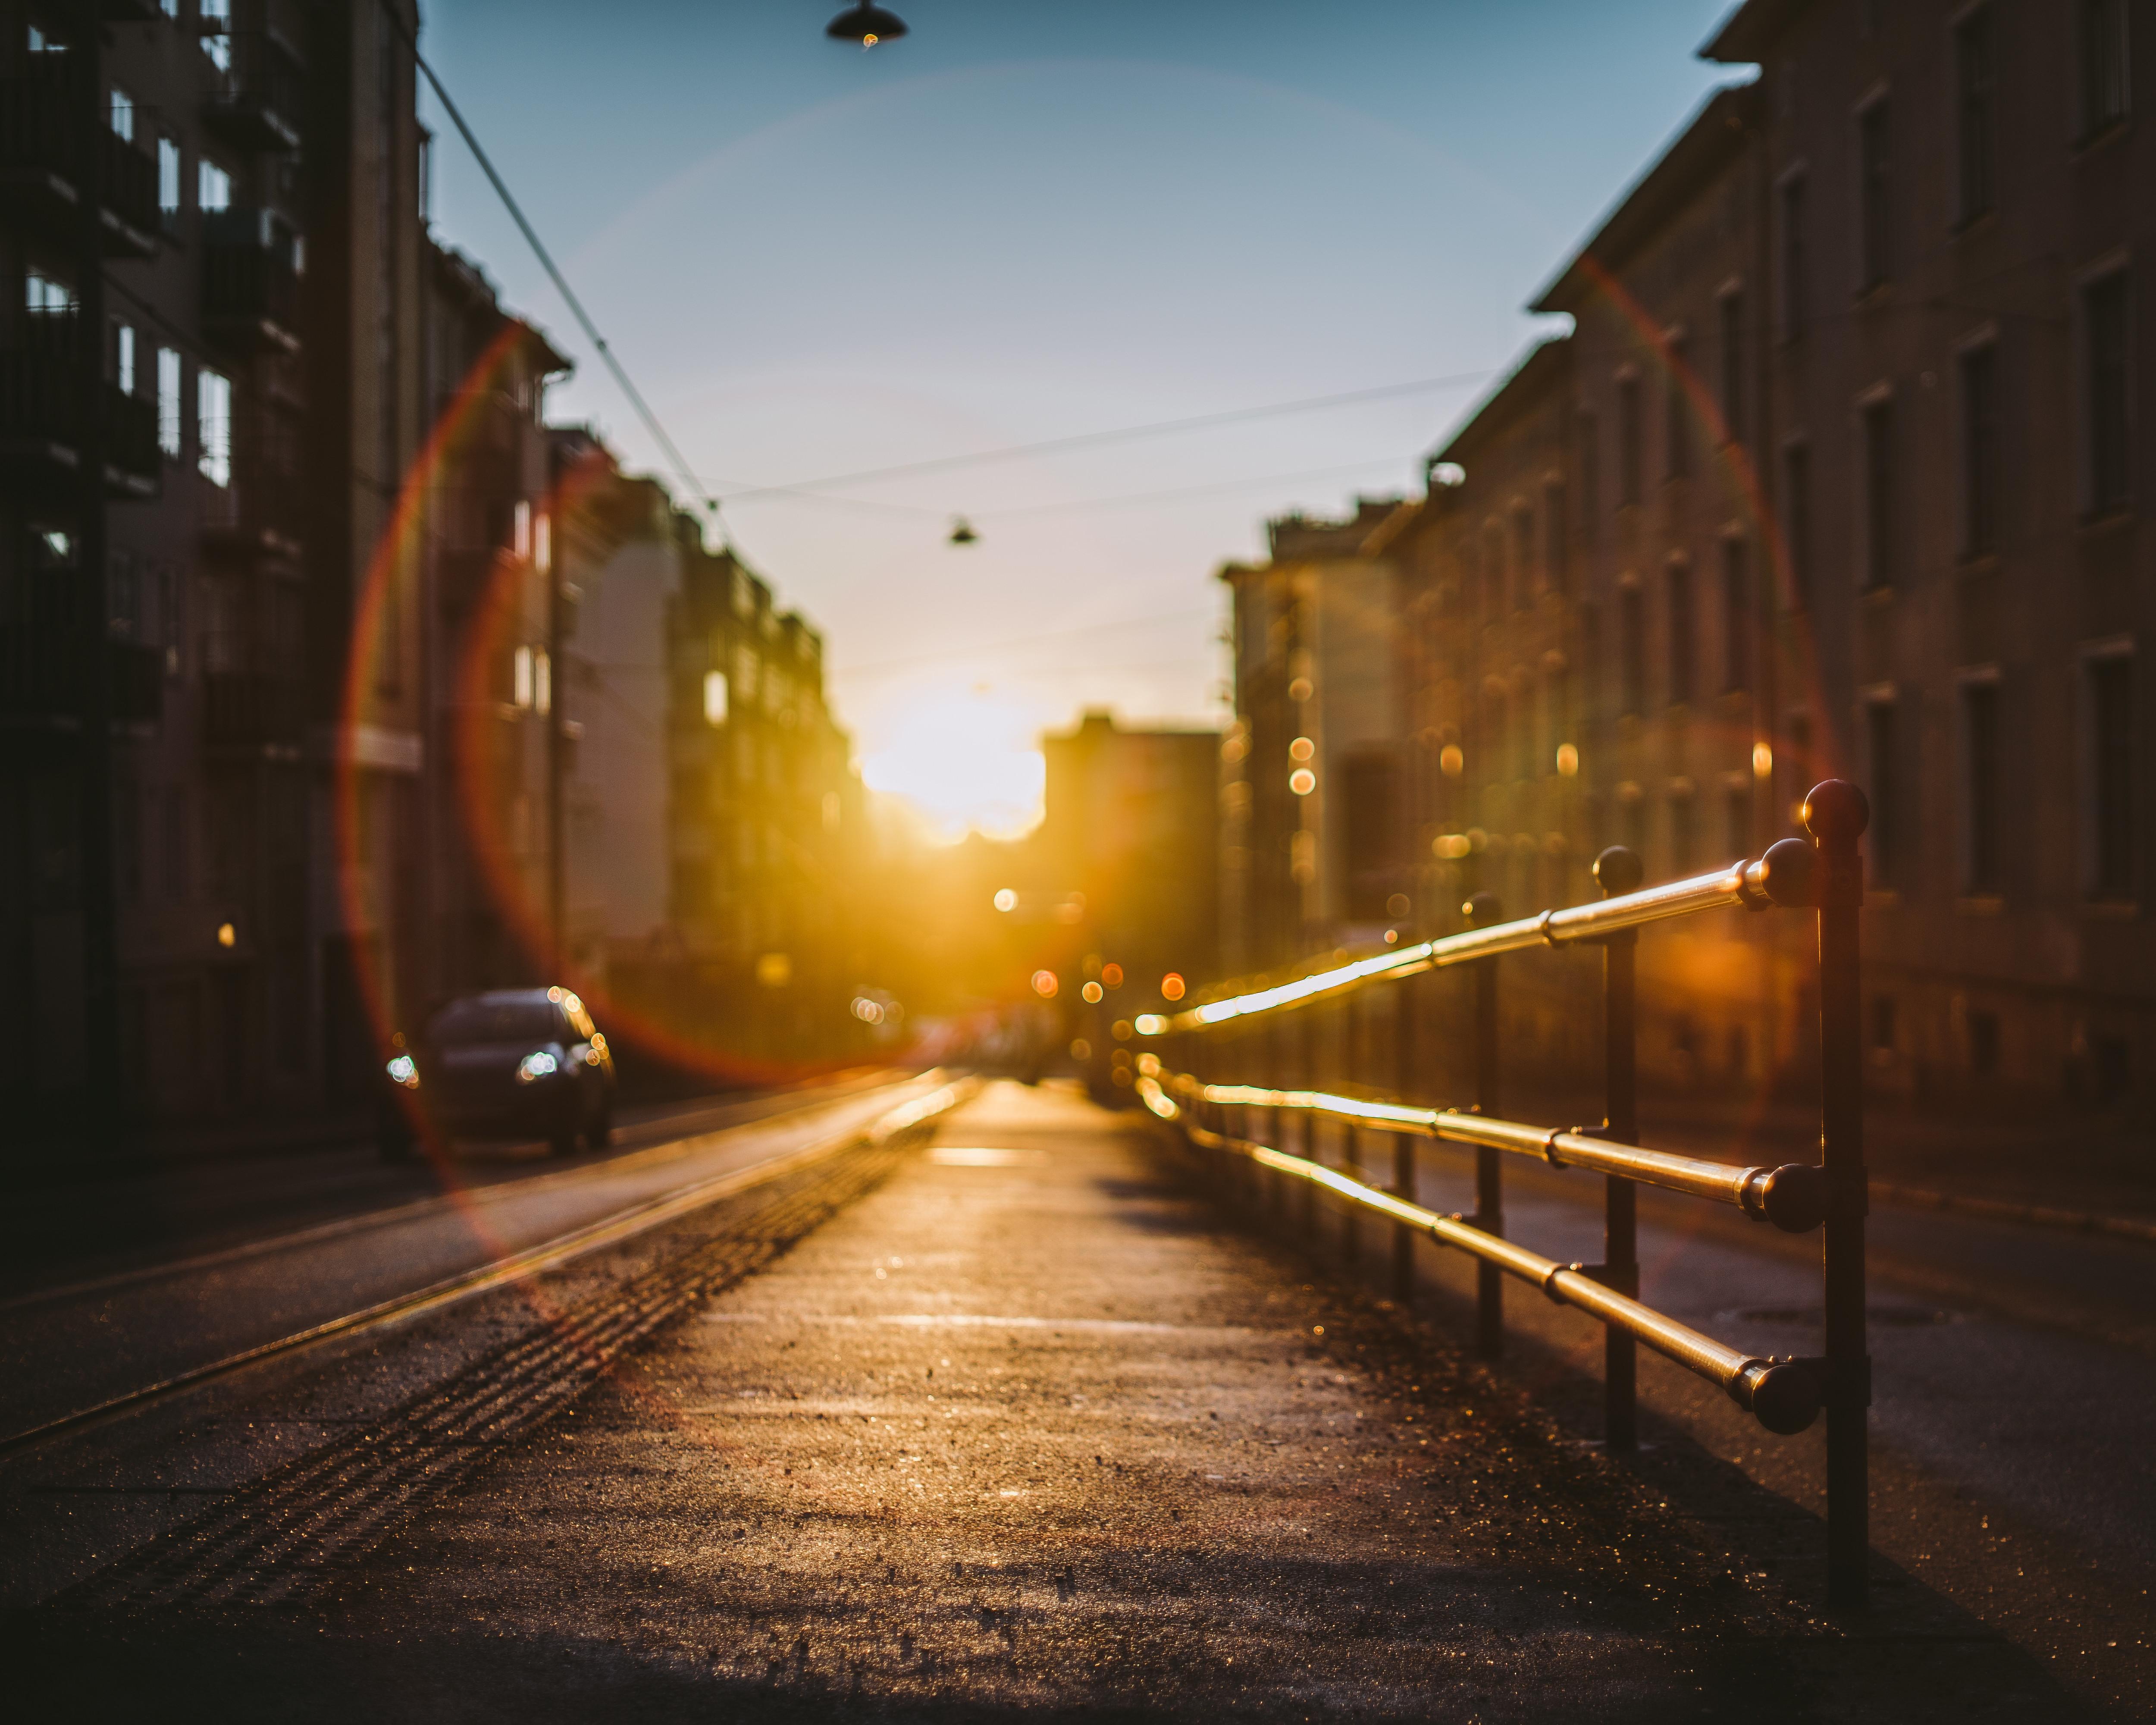 norway city sunset railing 4k 1616092001 - Norway City Sunset Railing 4k - Norway City Sunset Railing 4k wallpapers